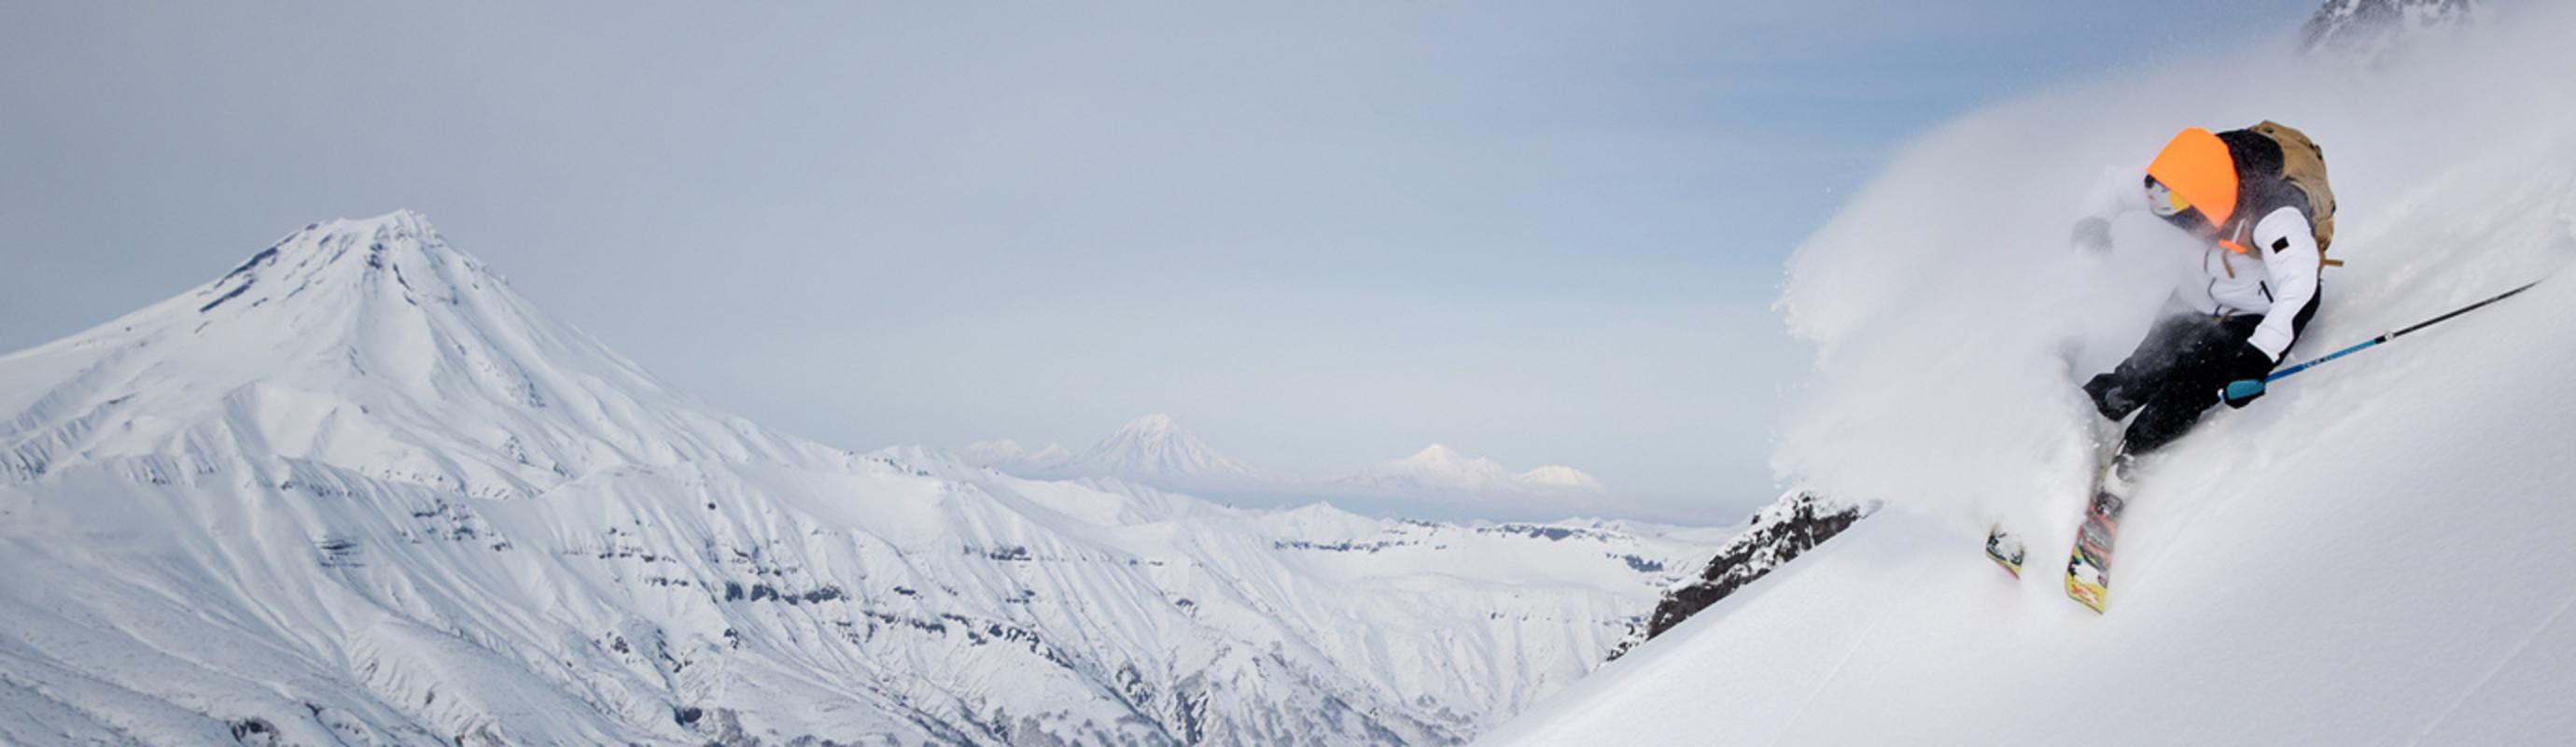 Blog: De leukste wintersport cadeaus